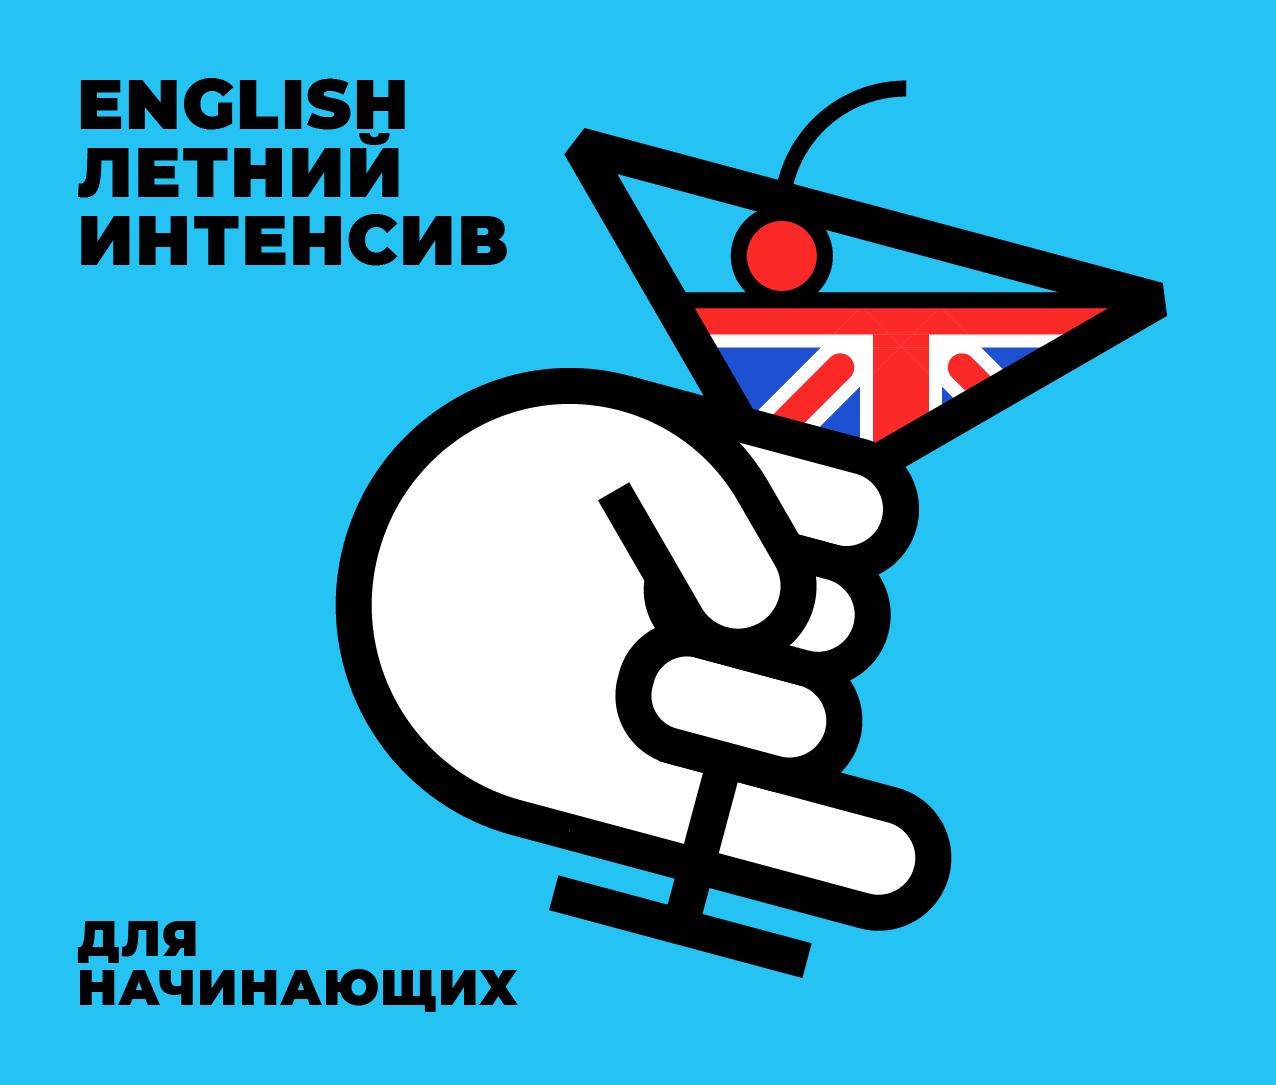 Летний интенсивный курс английского языка